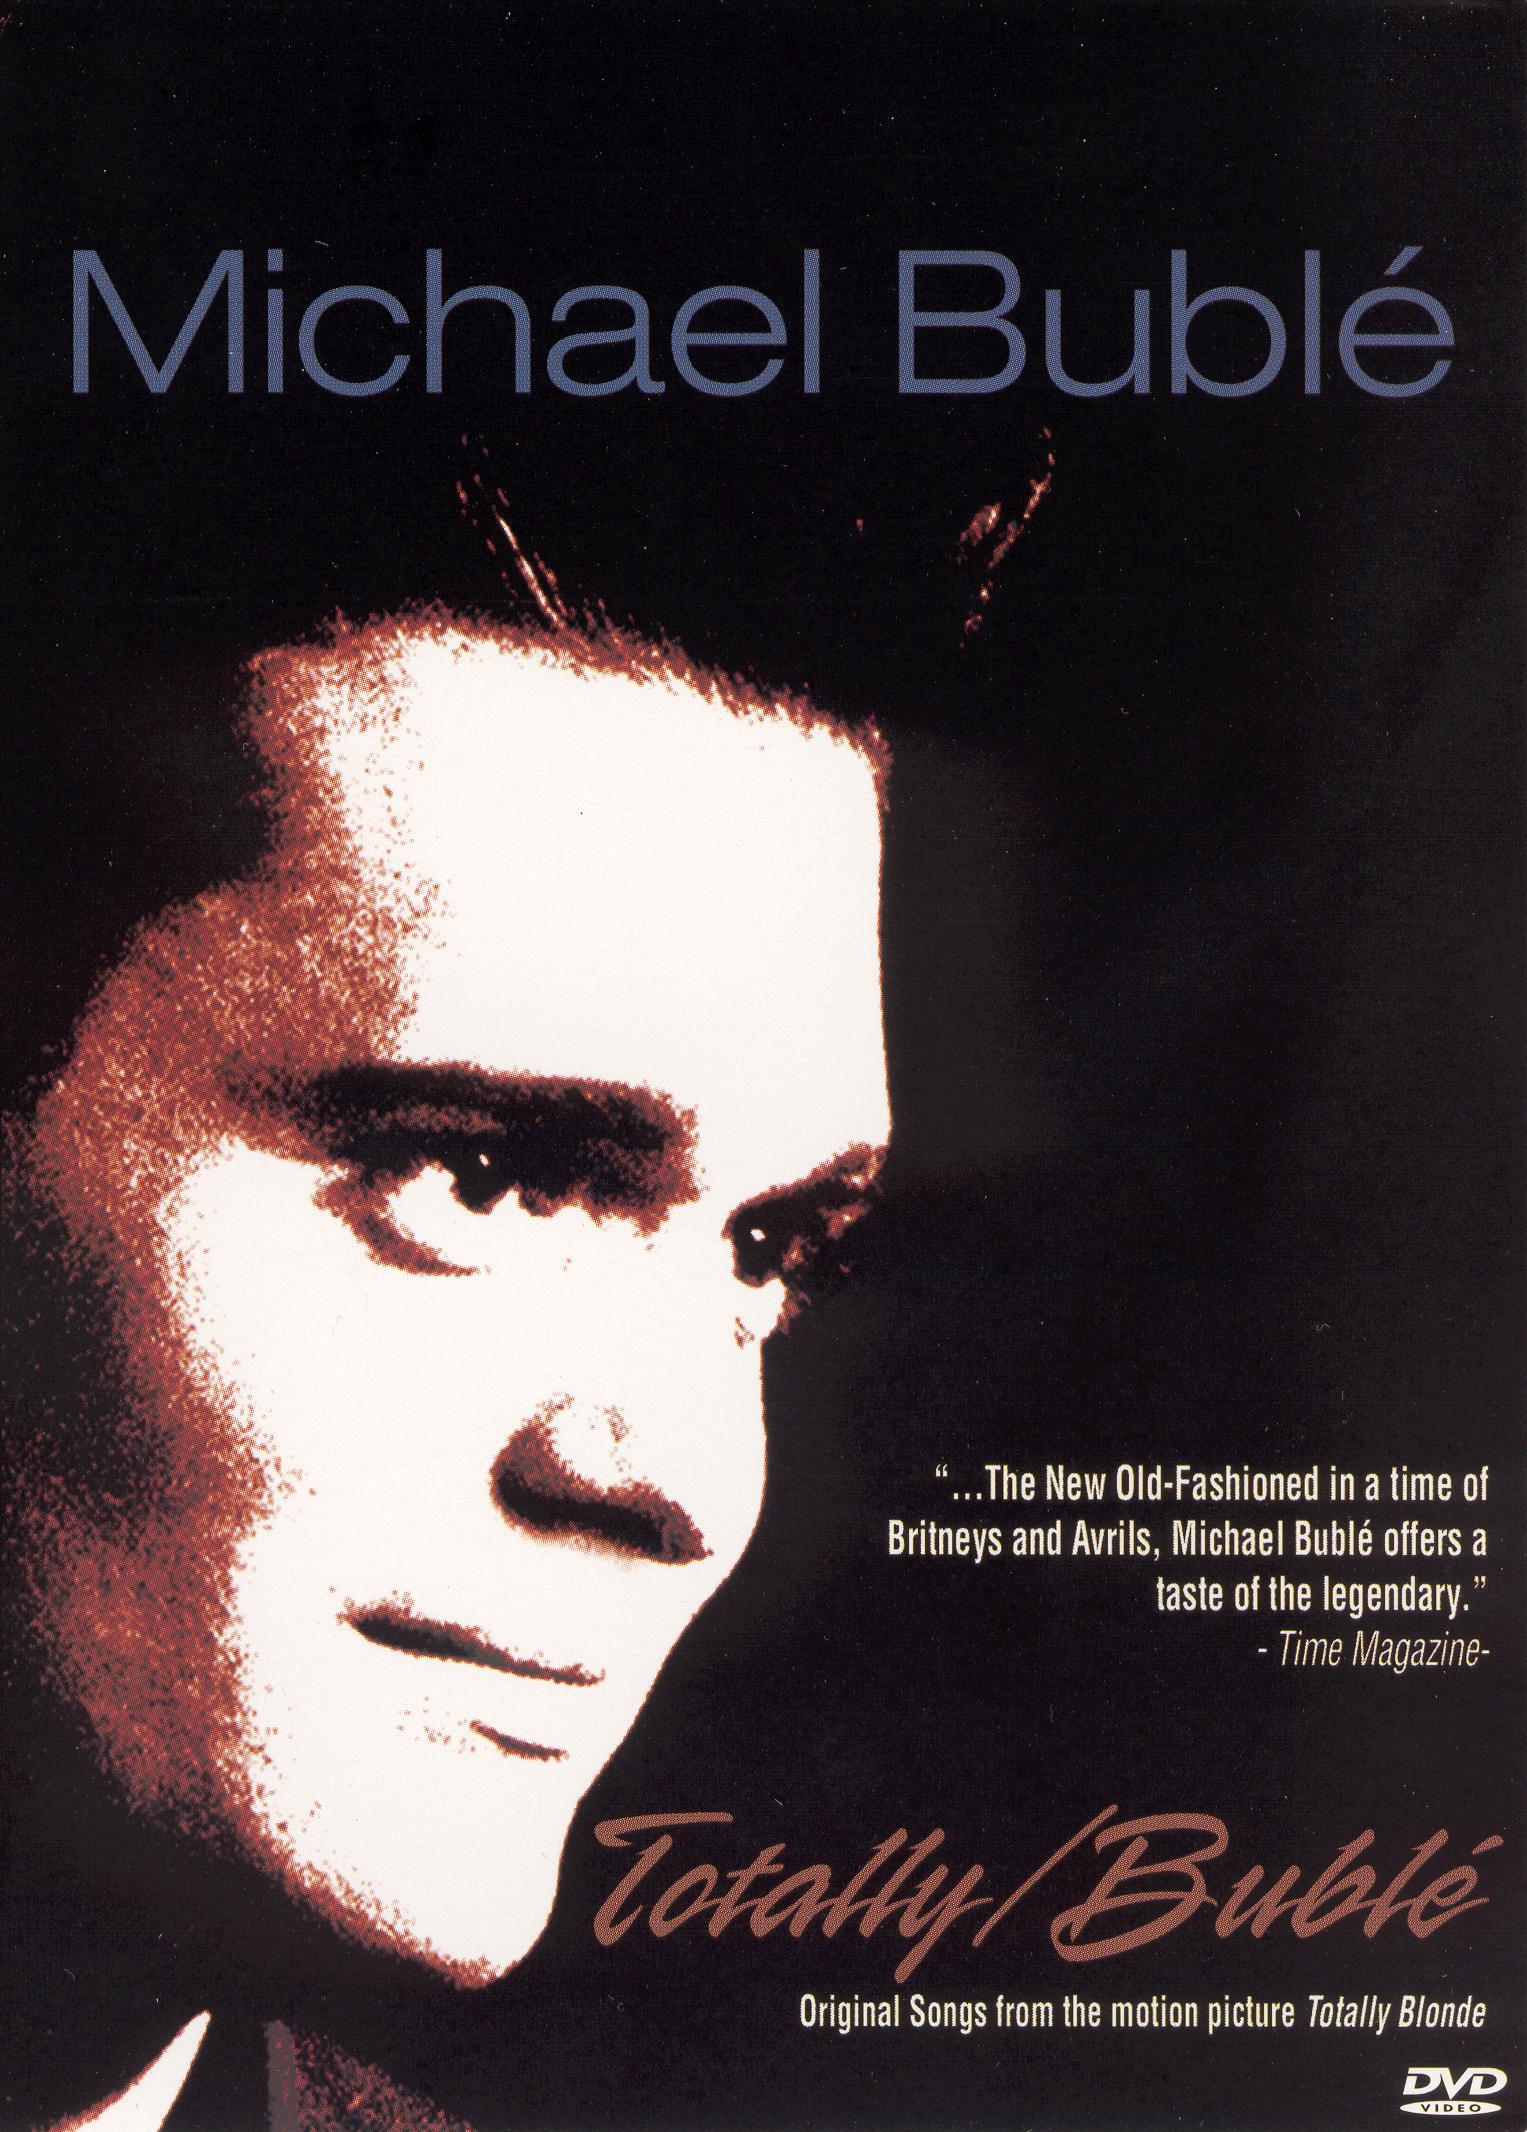 Michael Bublé: Totally Bublé